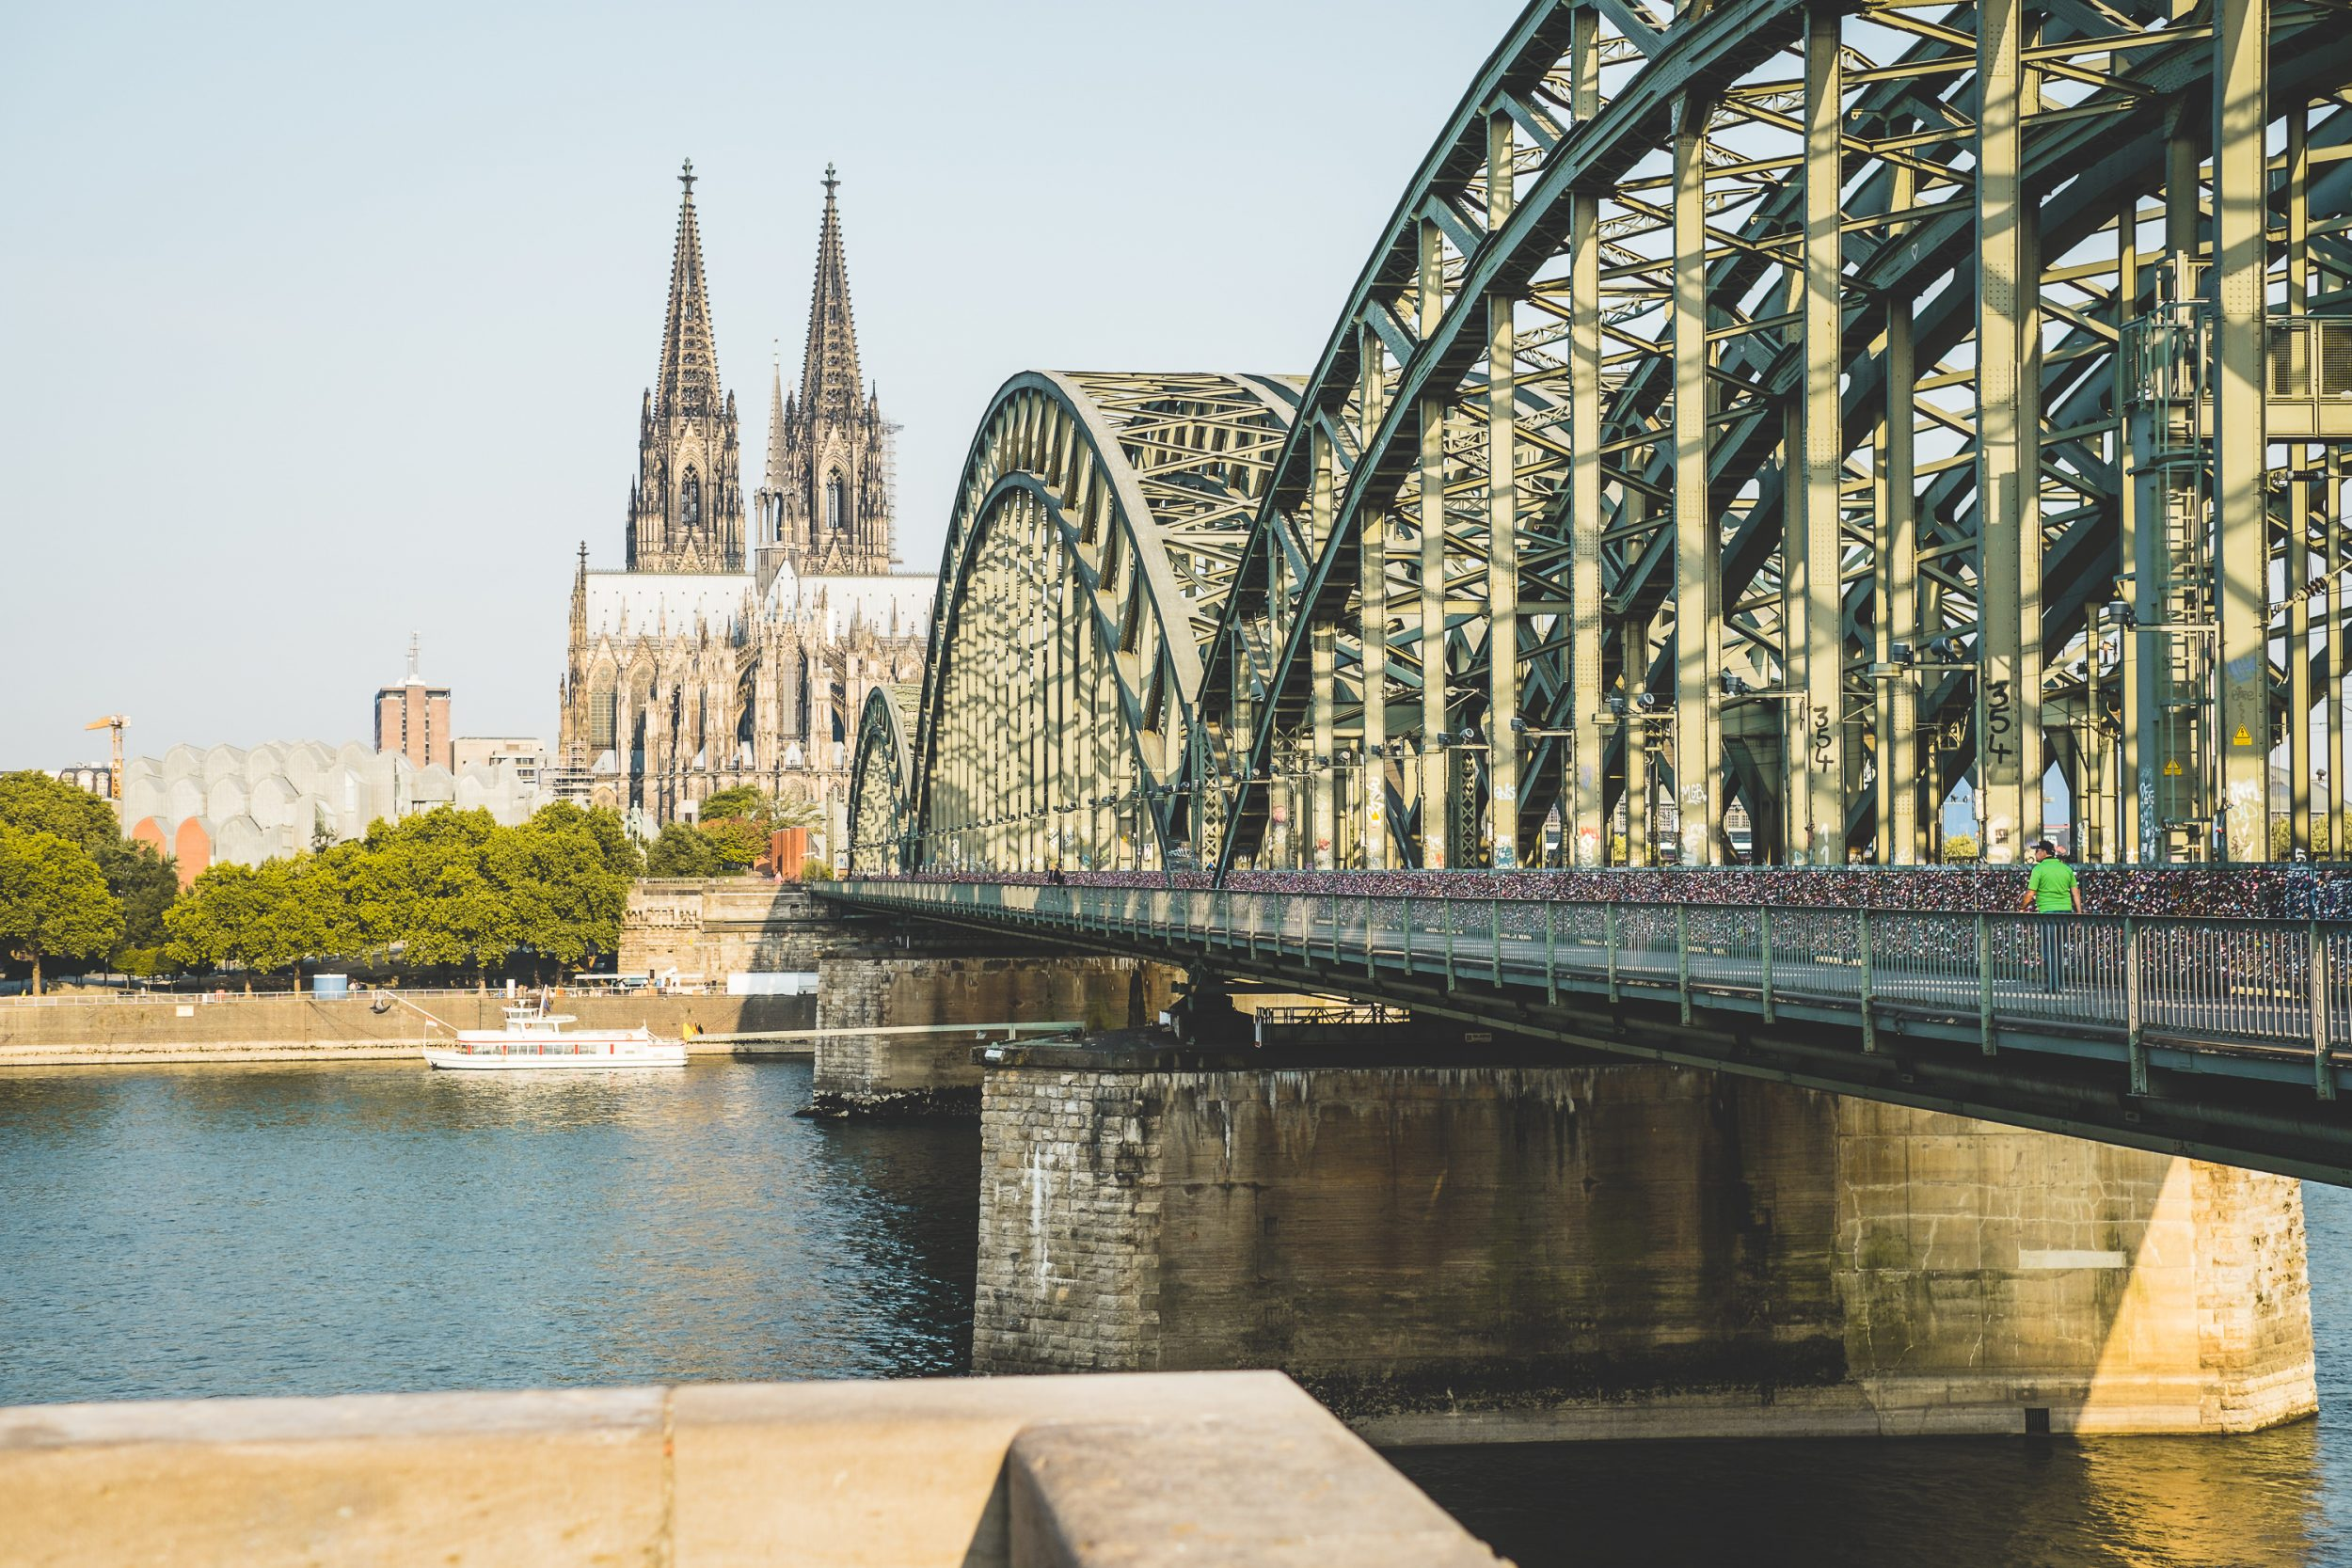 Lock-Bridge-Hohenzollernbrücke-Cologne-Germany.jpg